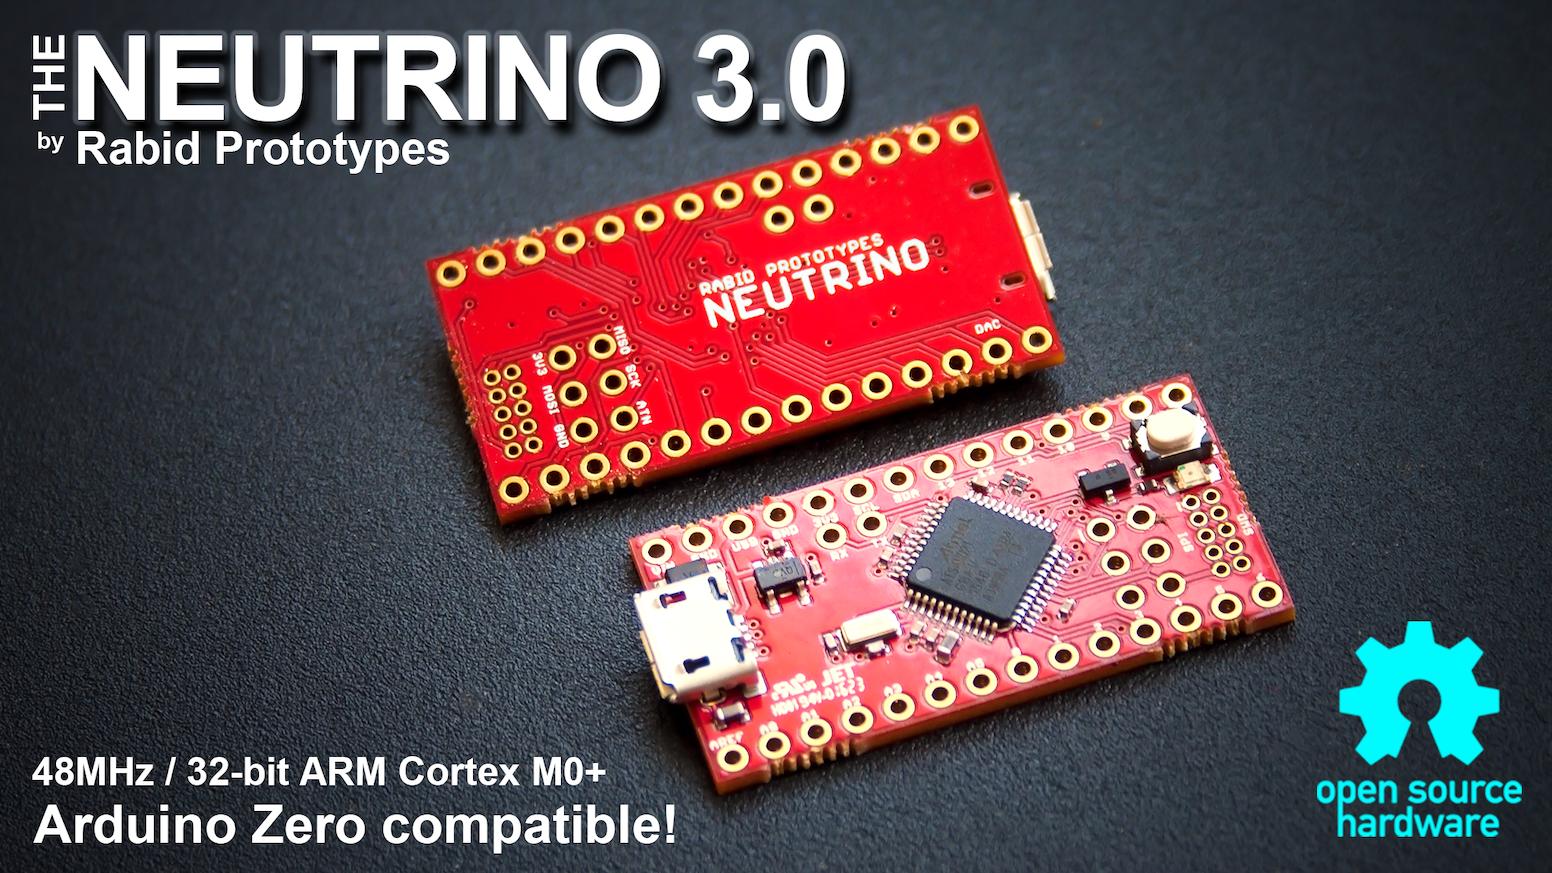 Neutrino 30 The 32 Bit Arduino Zero Compatible By Rabid Digital Power Control Mcu Featuring A 48mhz Arm Cortex M0 Processor Is Fully